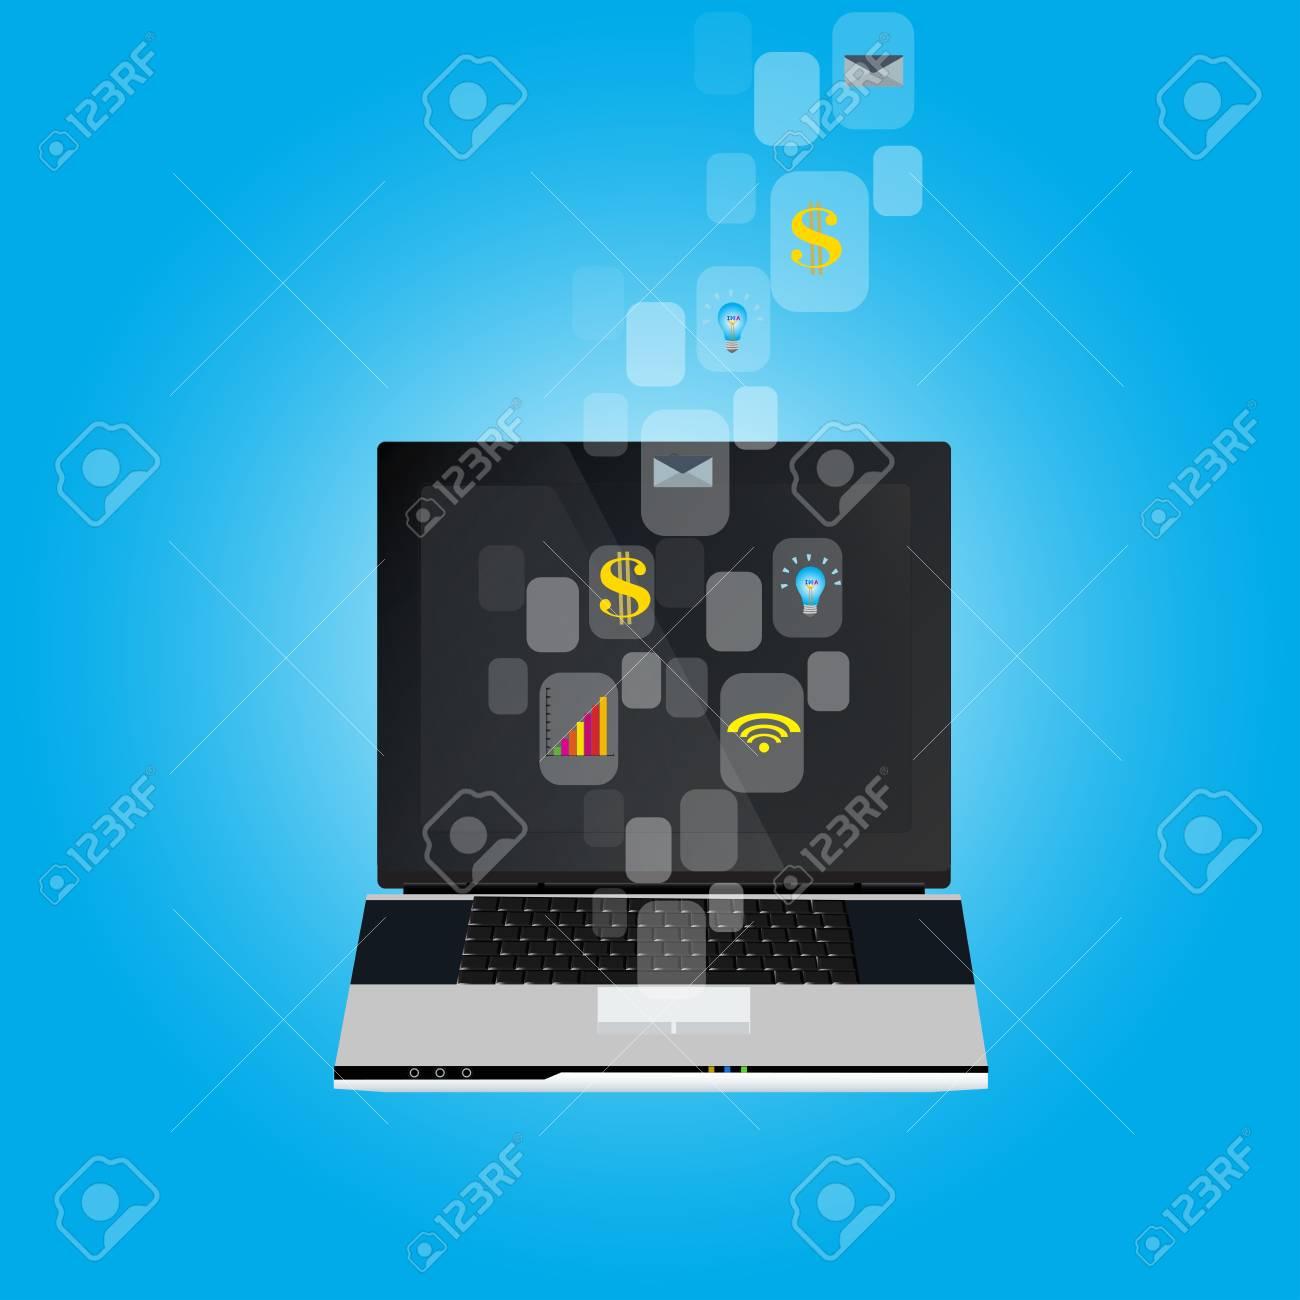 business , e-commerce concept illustration Stock Vector - 17455351